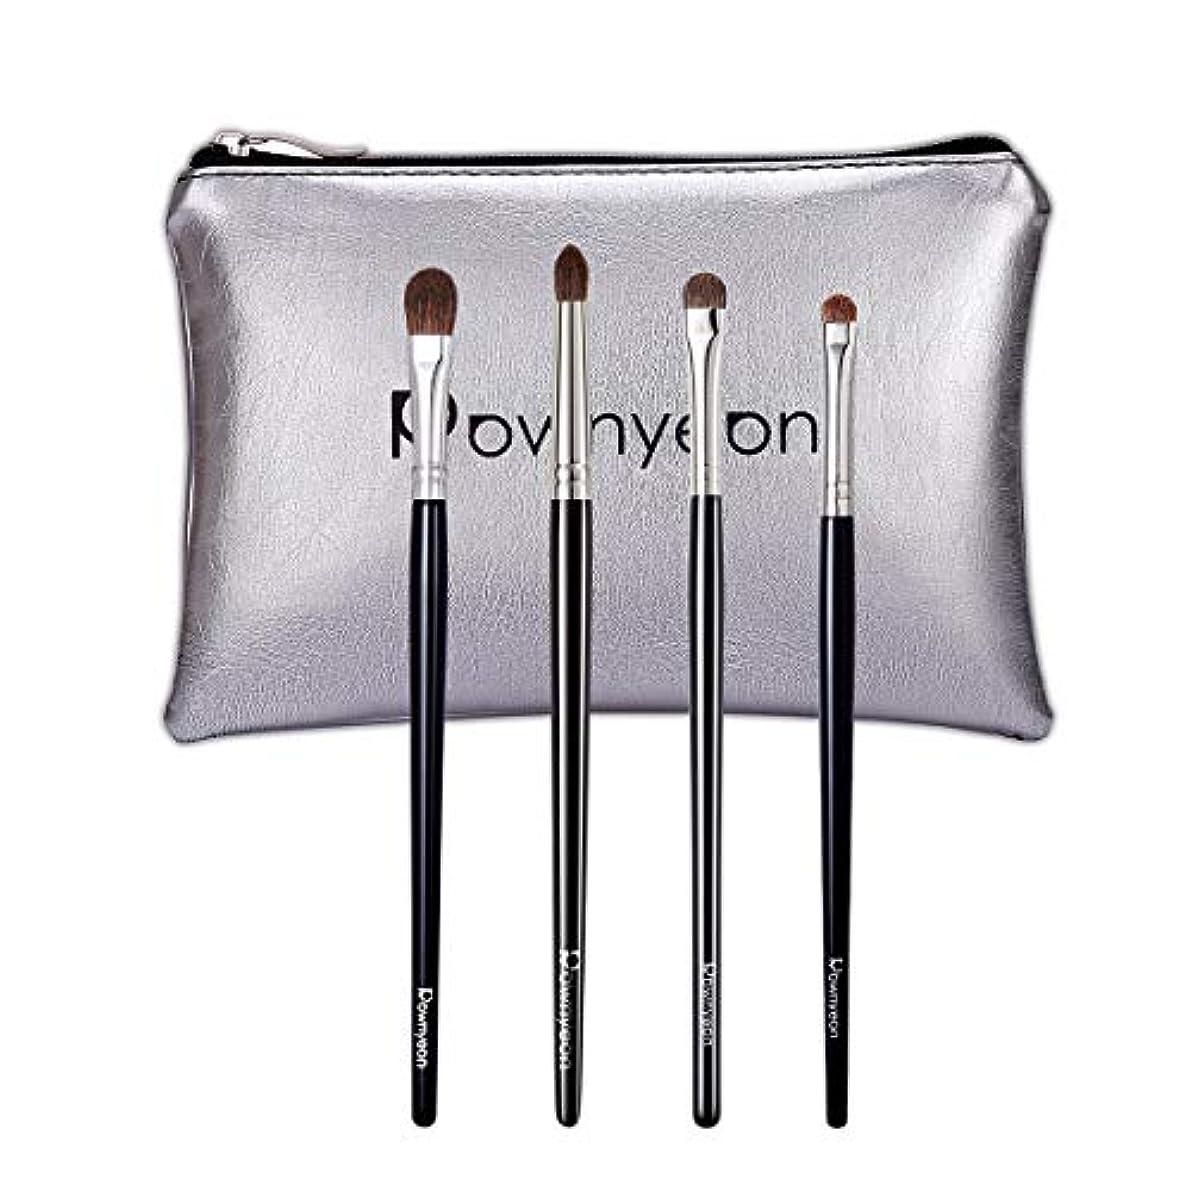 Rownyeon アイシャドウブラシセット 4本 アイメイクブラシ セット 化粧筆 100%高級天然毛 粉含み抜群 平筆型 尖り ブレンディングブラシ(ポーチ付き)